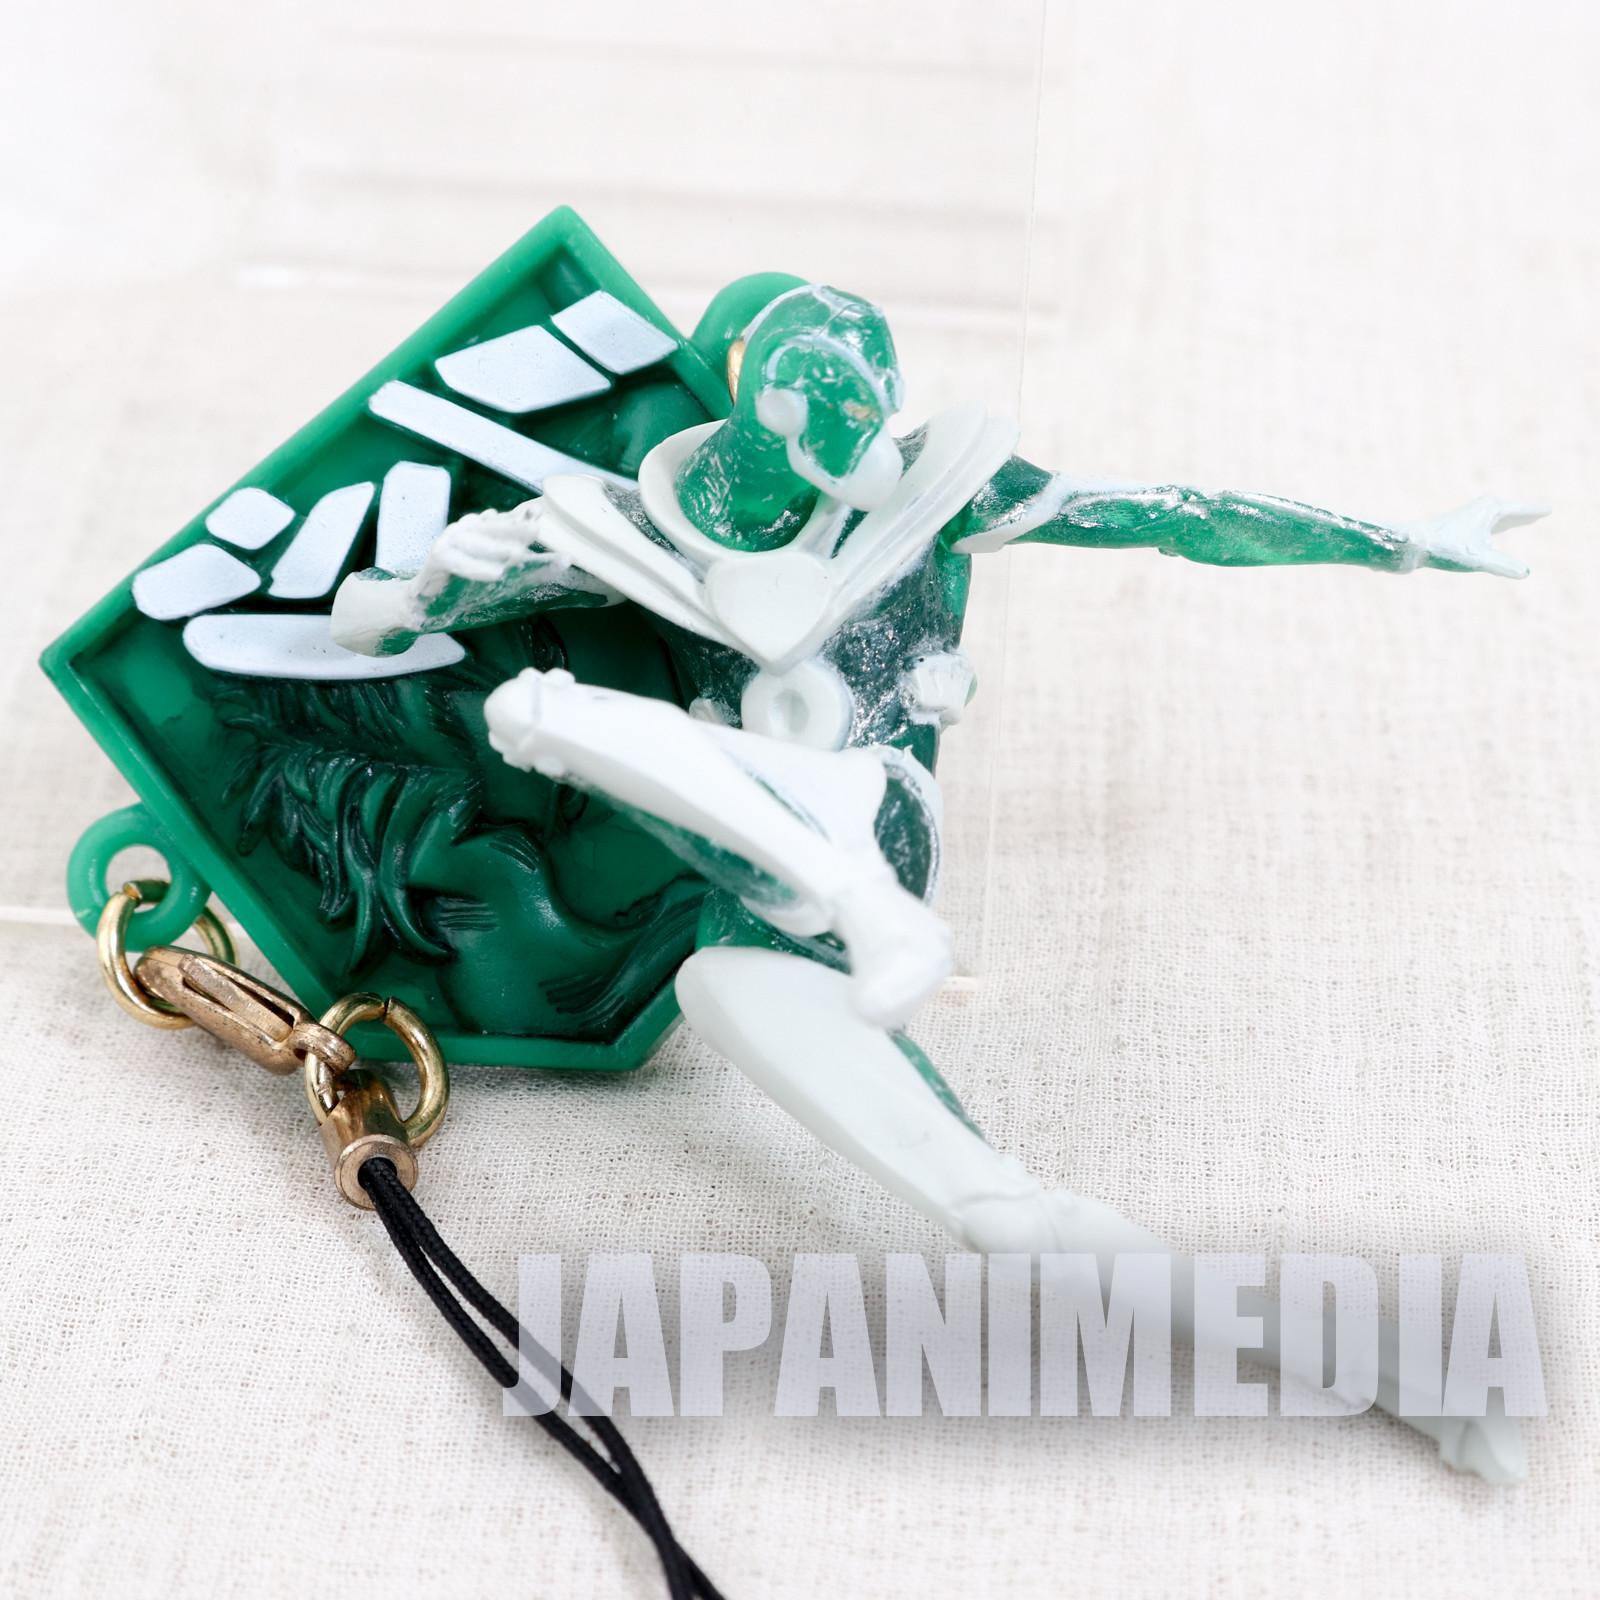 JoJo's Bizarre Adventure Hierophant Green Noriaki Kakyoin Mobile Strap JAPAN